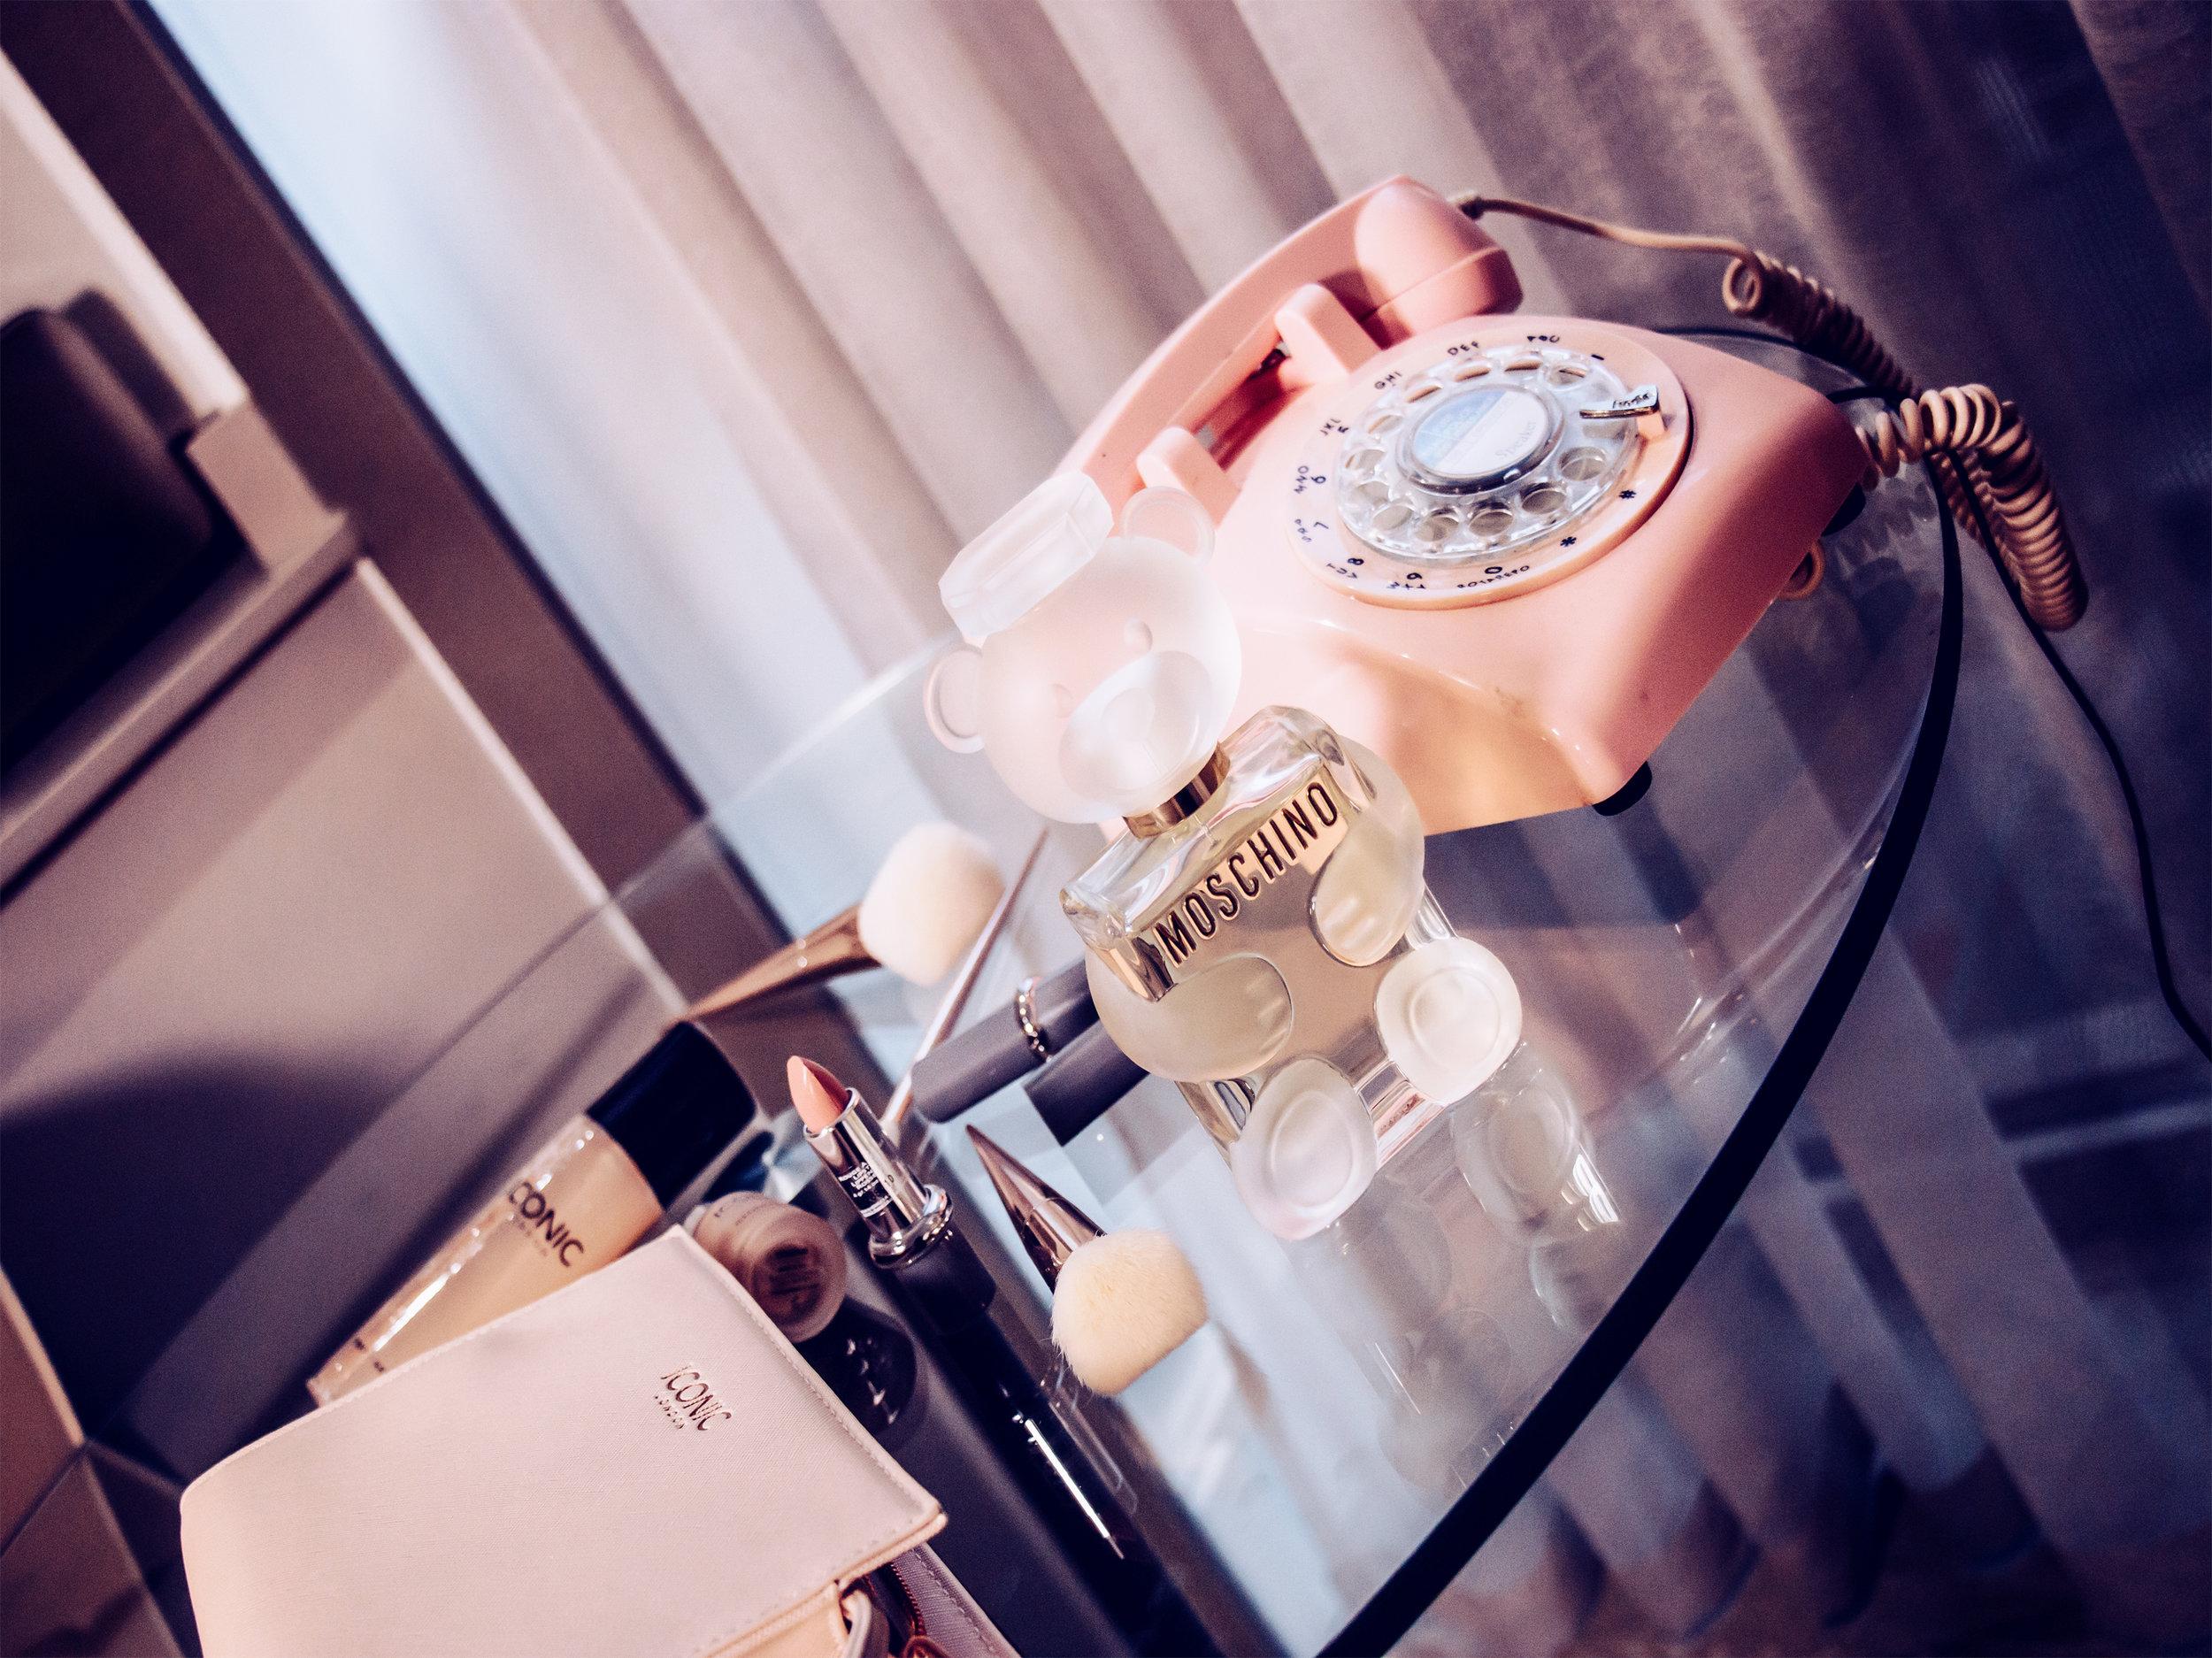 Moschino Toy 2 100ml perfume review 2.jpg